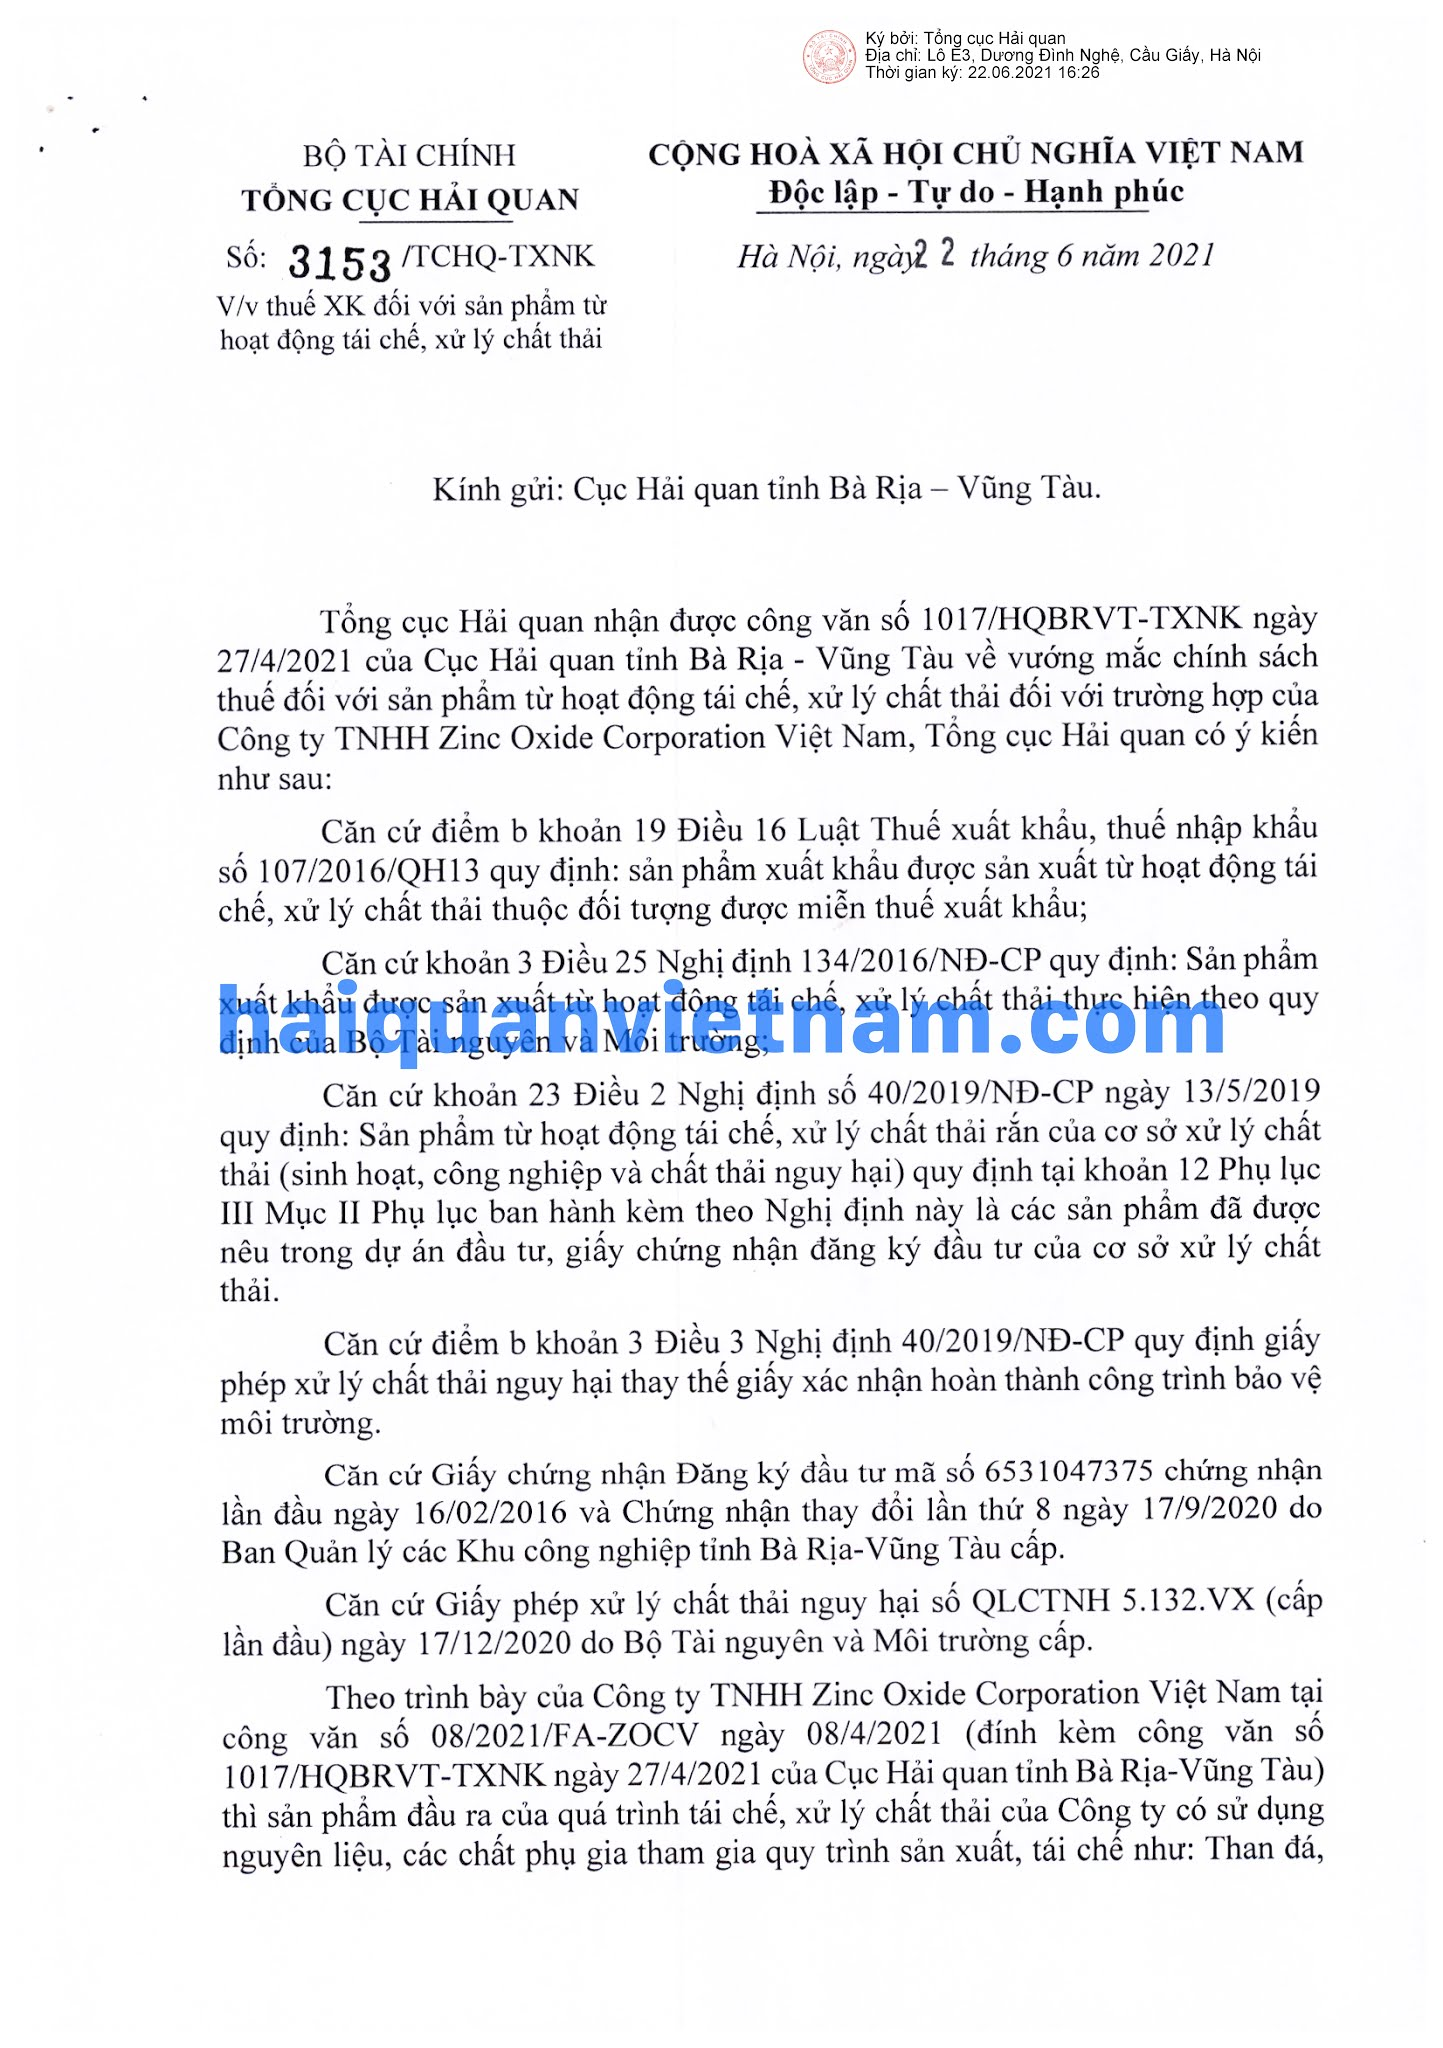 [Image: 210622_3153_TCHQ-TXNK_haiquanvietnam_01.jpg]